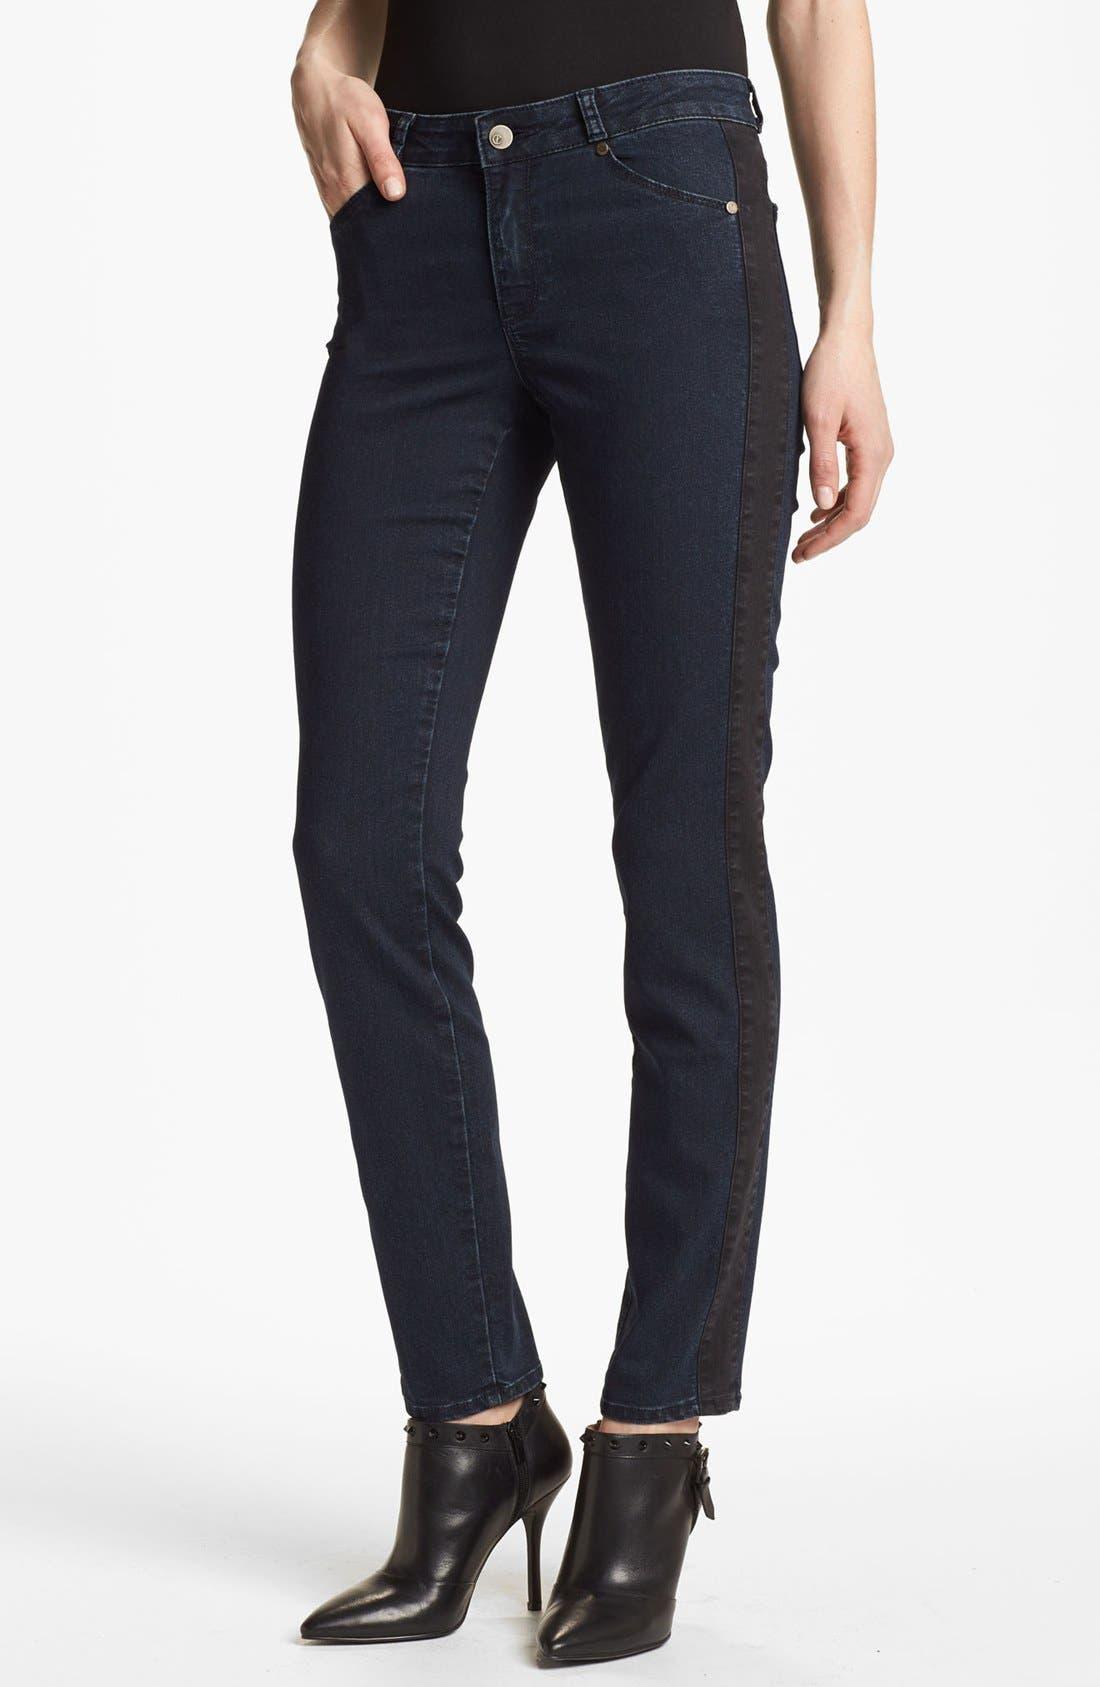 Alternate Image 1 Selected - CJ by Cookie Johnson Track Stripe Skinny Jeans